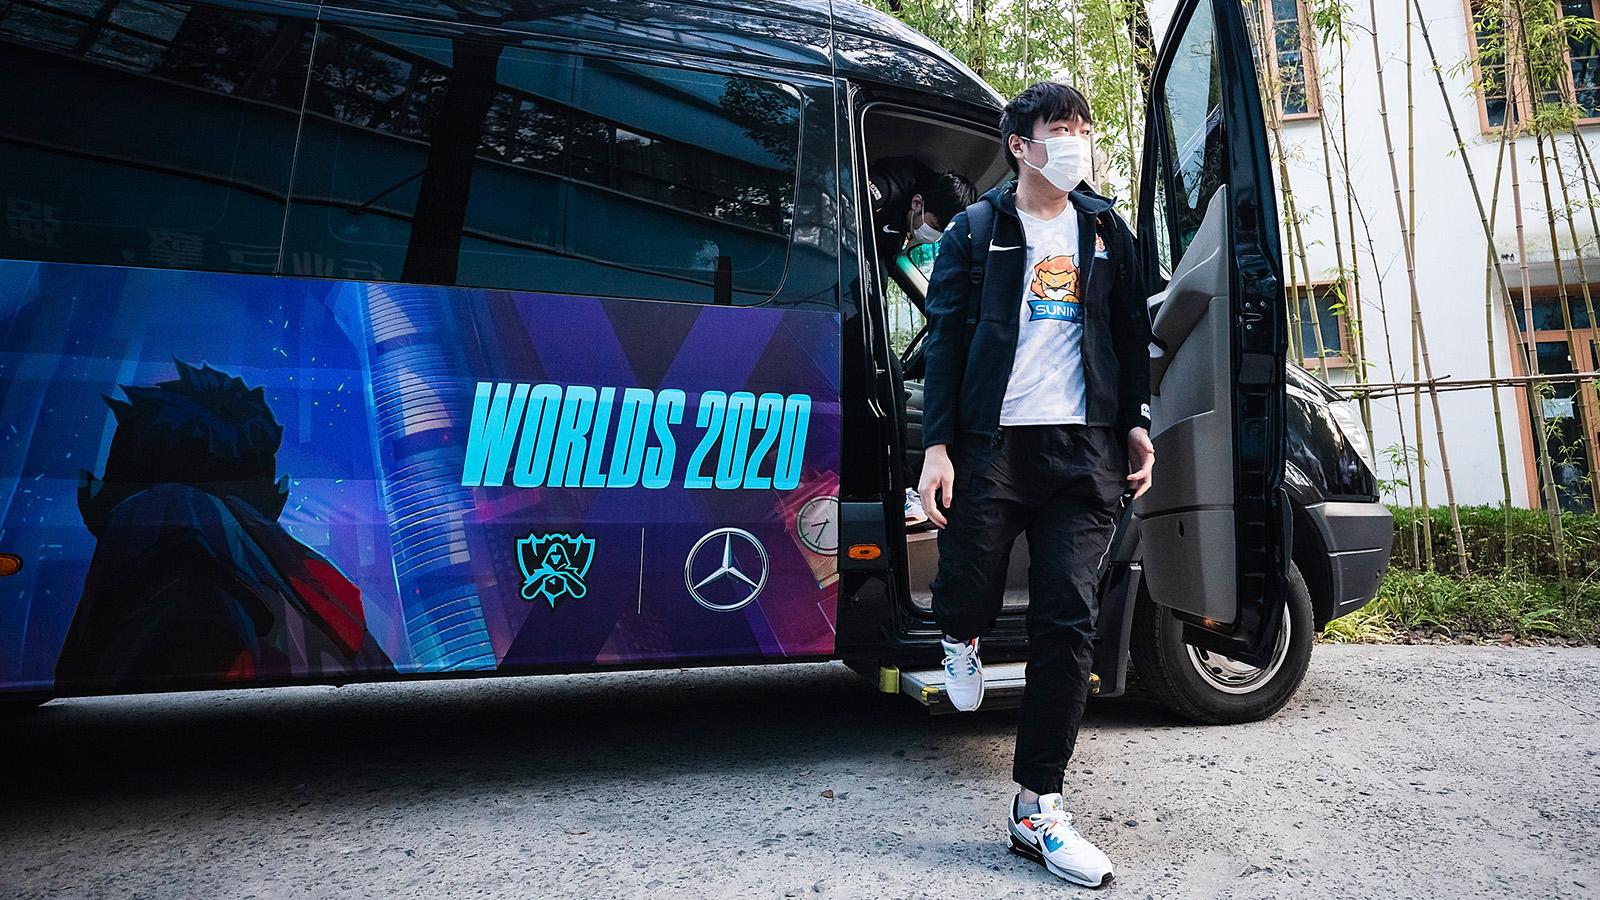 Worlds 2020 Suning Mercedes-Benz